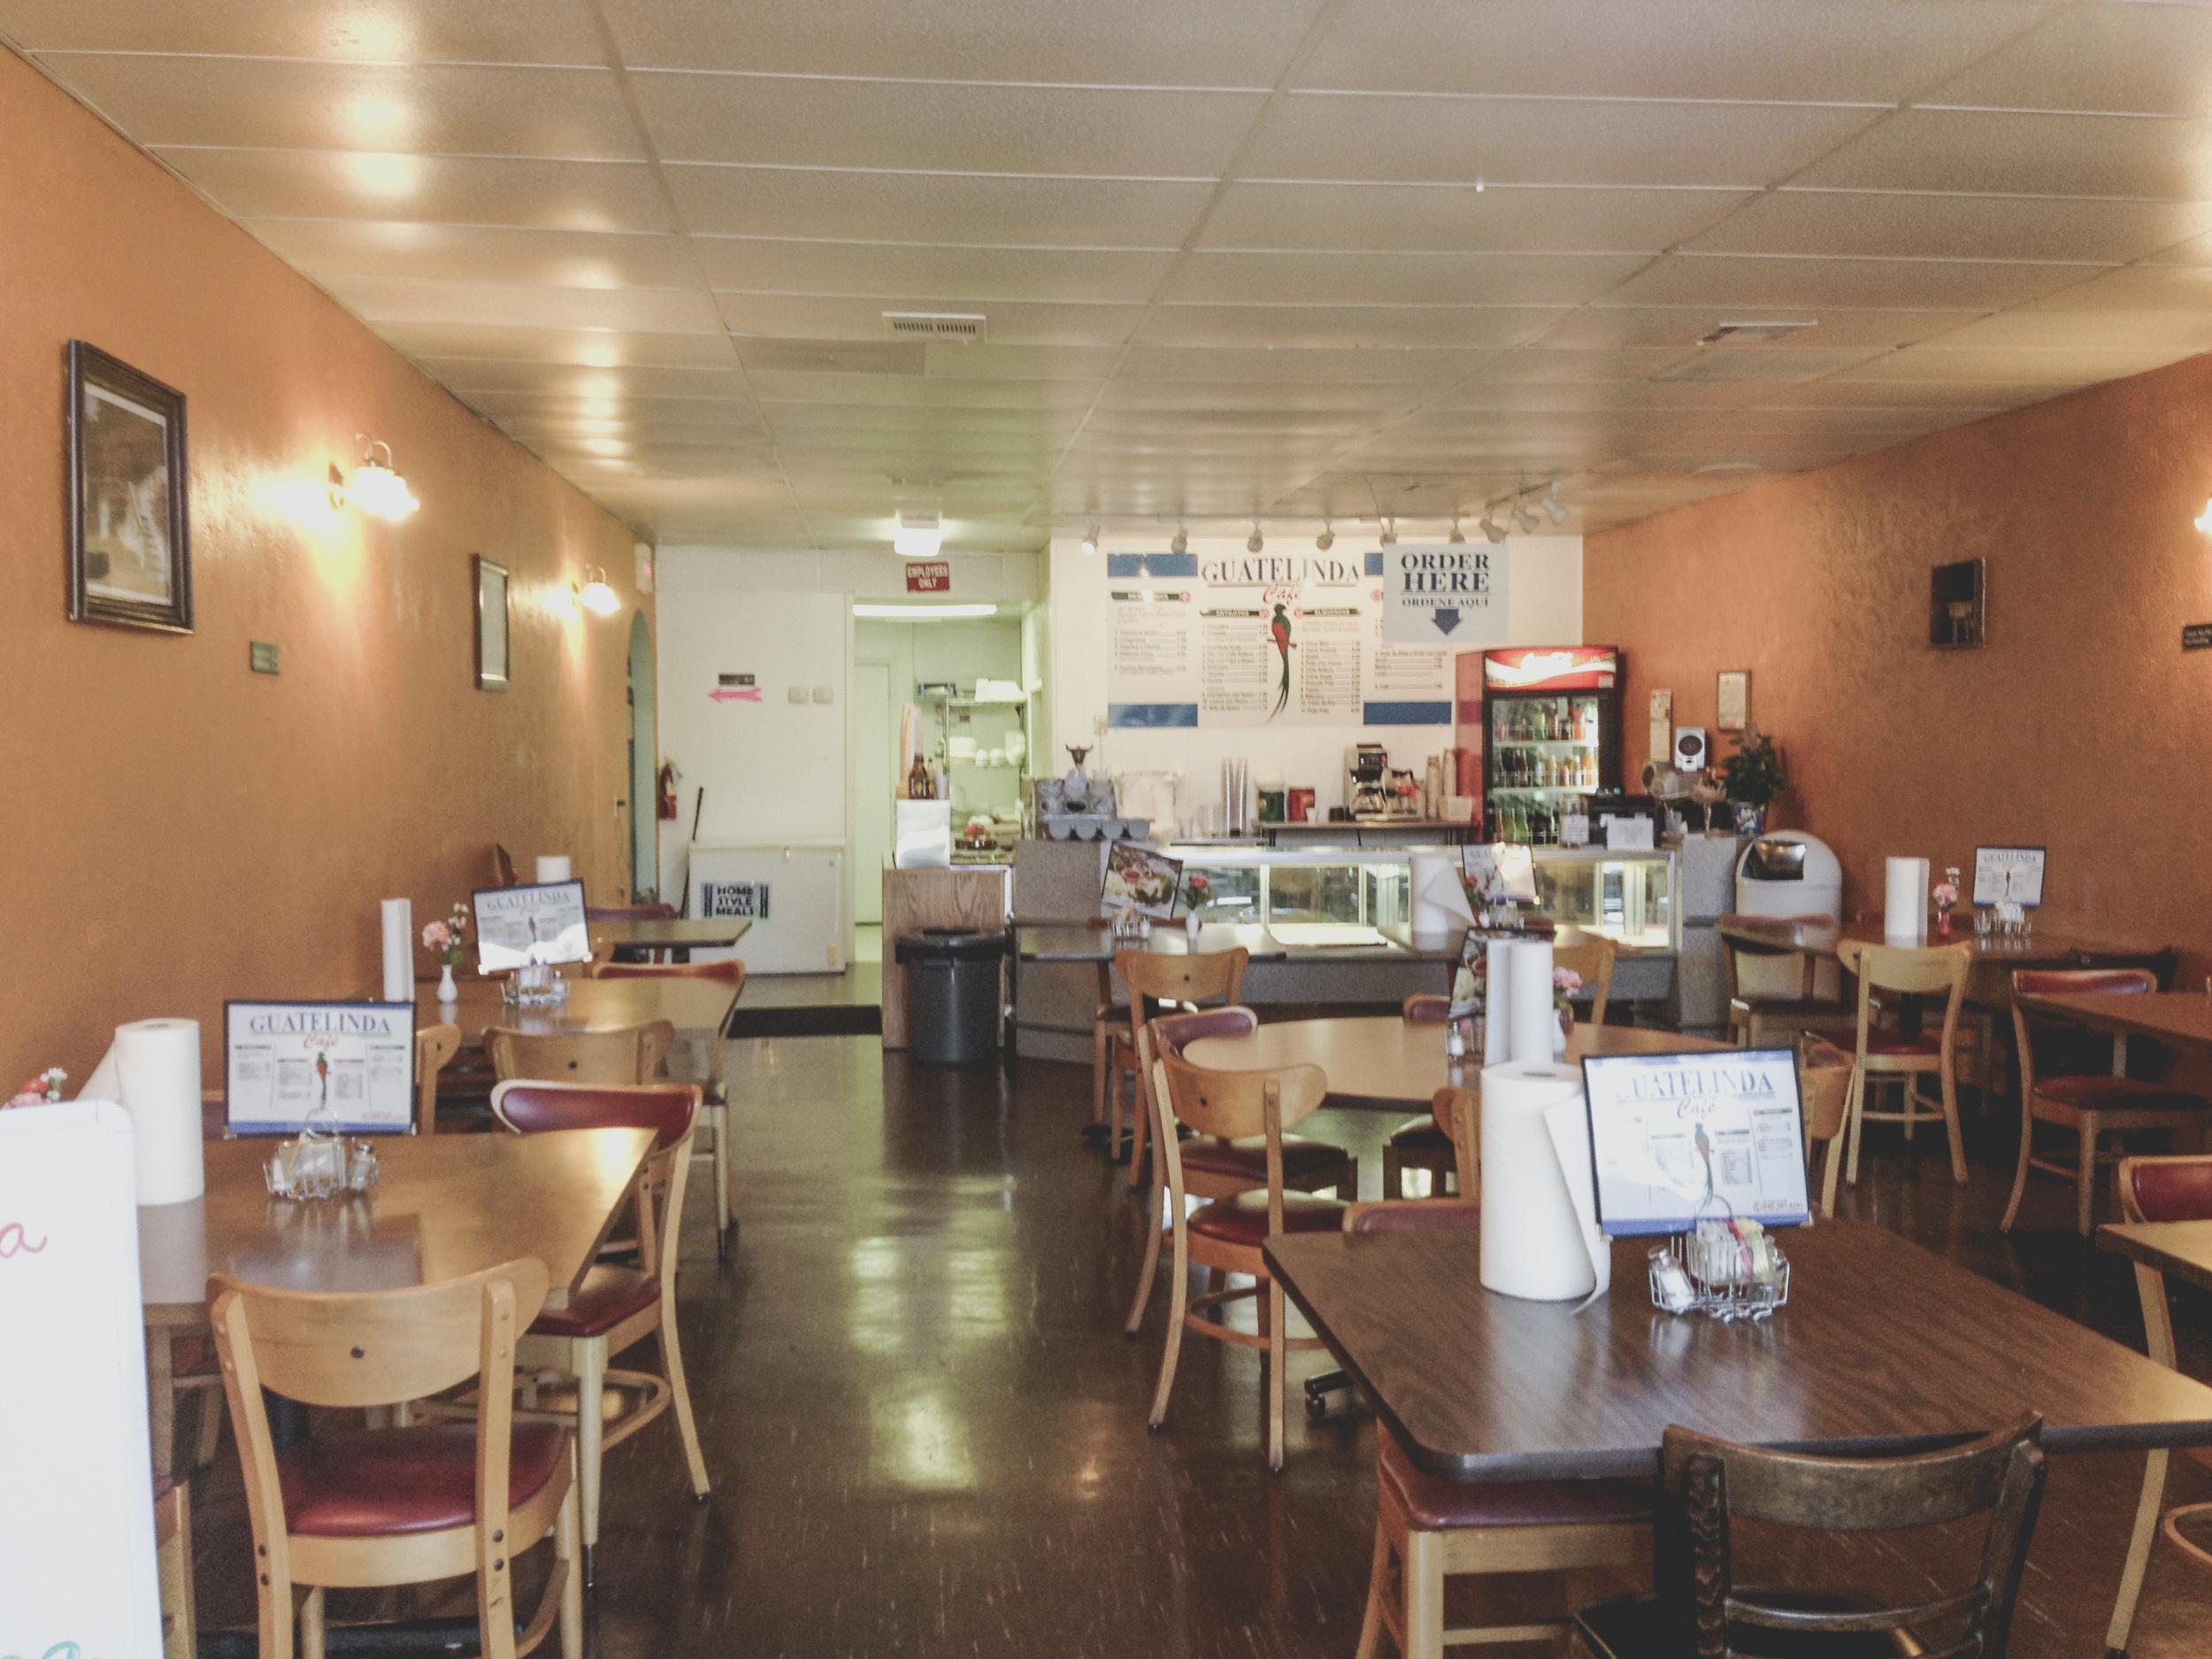 Guatelinda Cafe on Elm St. in Denton, TX.